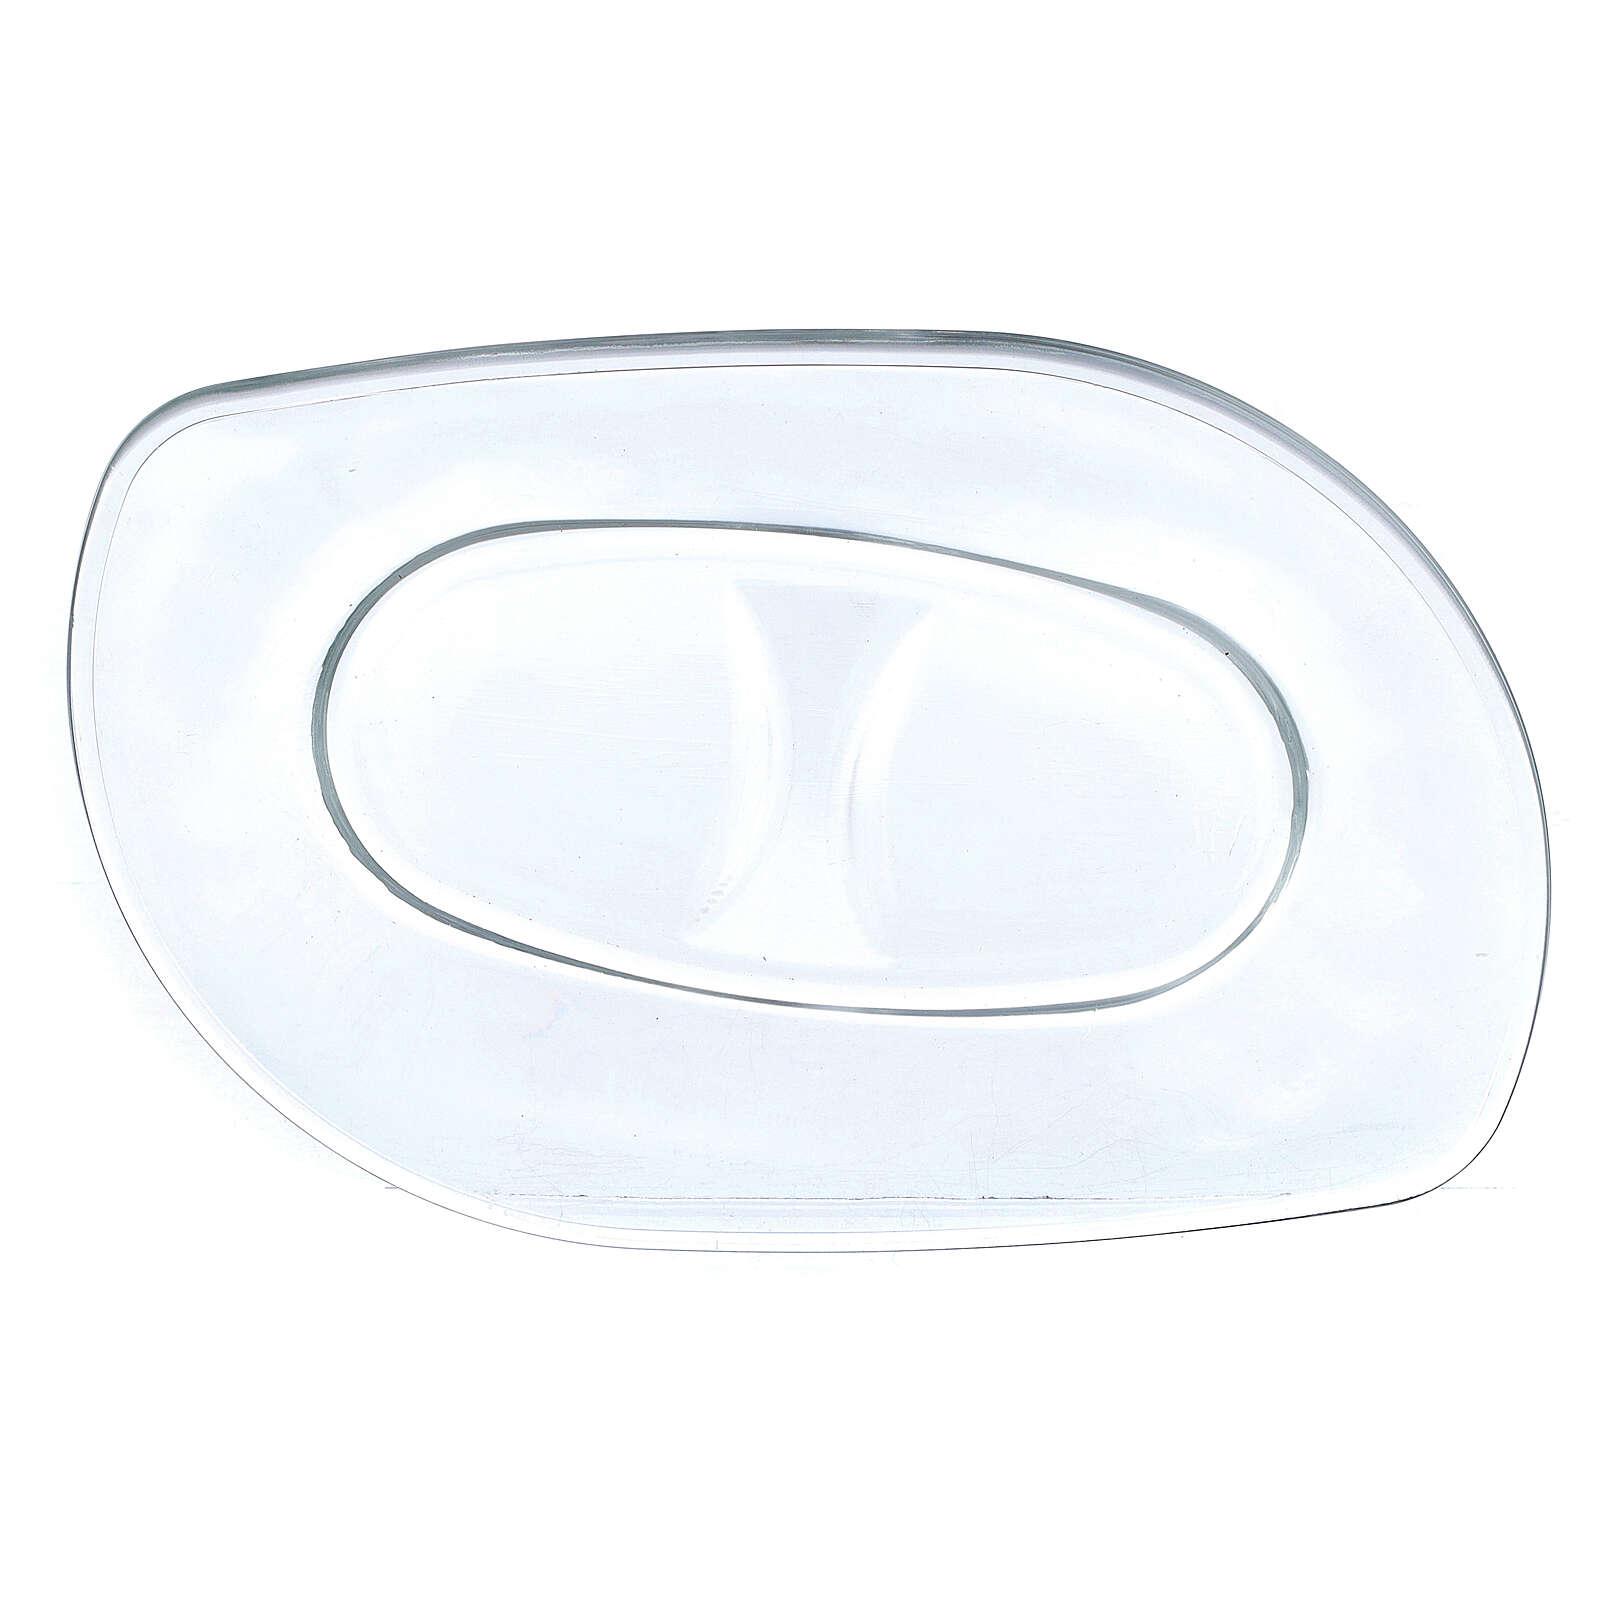 Glass cruets with plate 50 ml 4